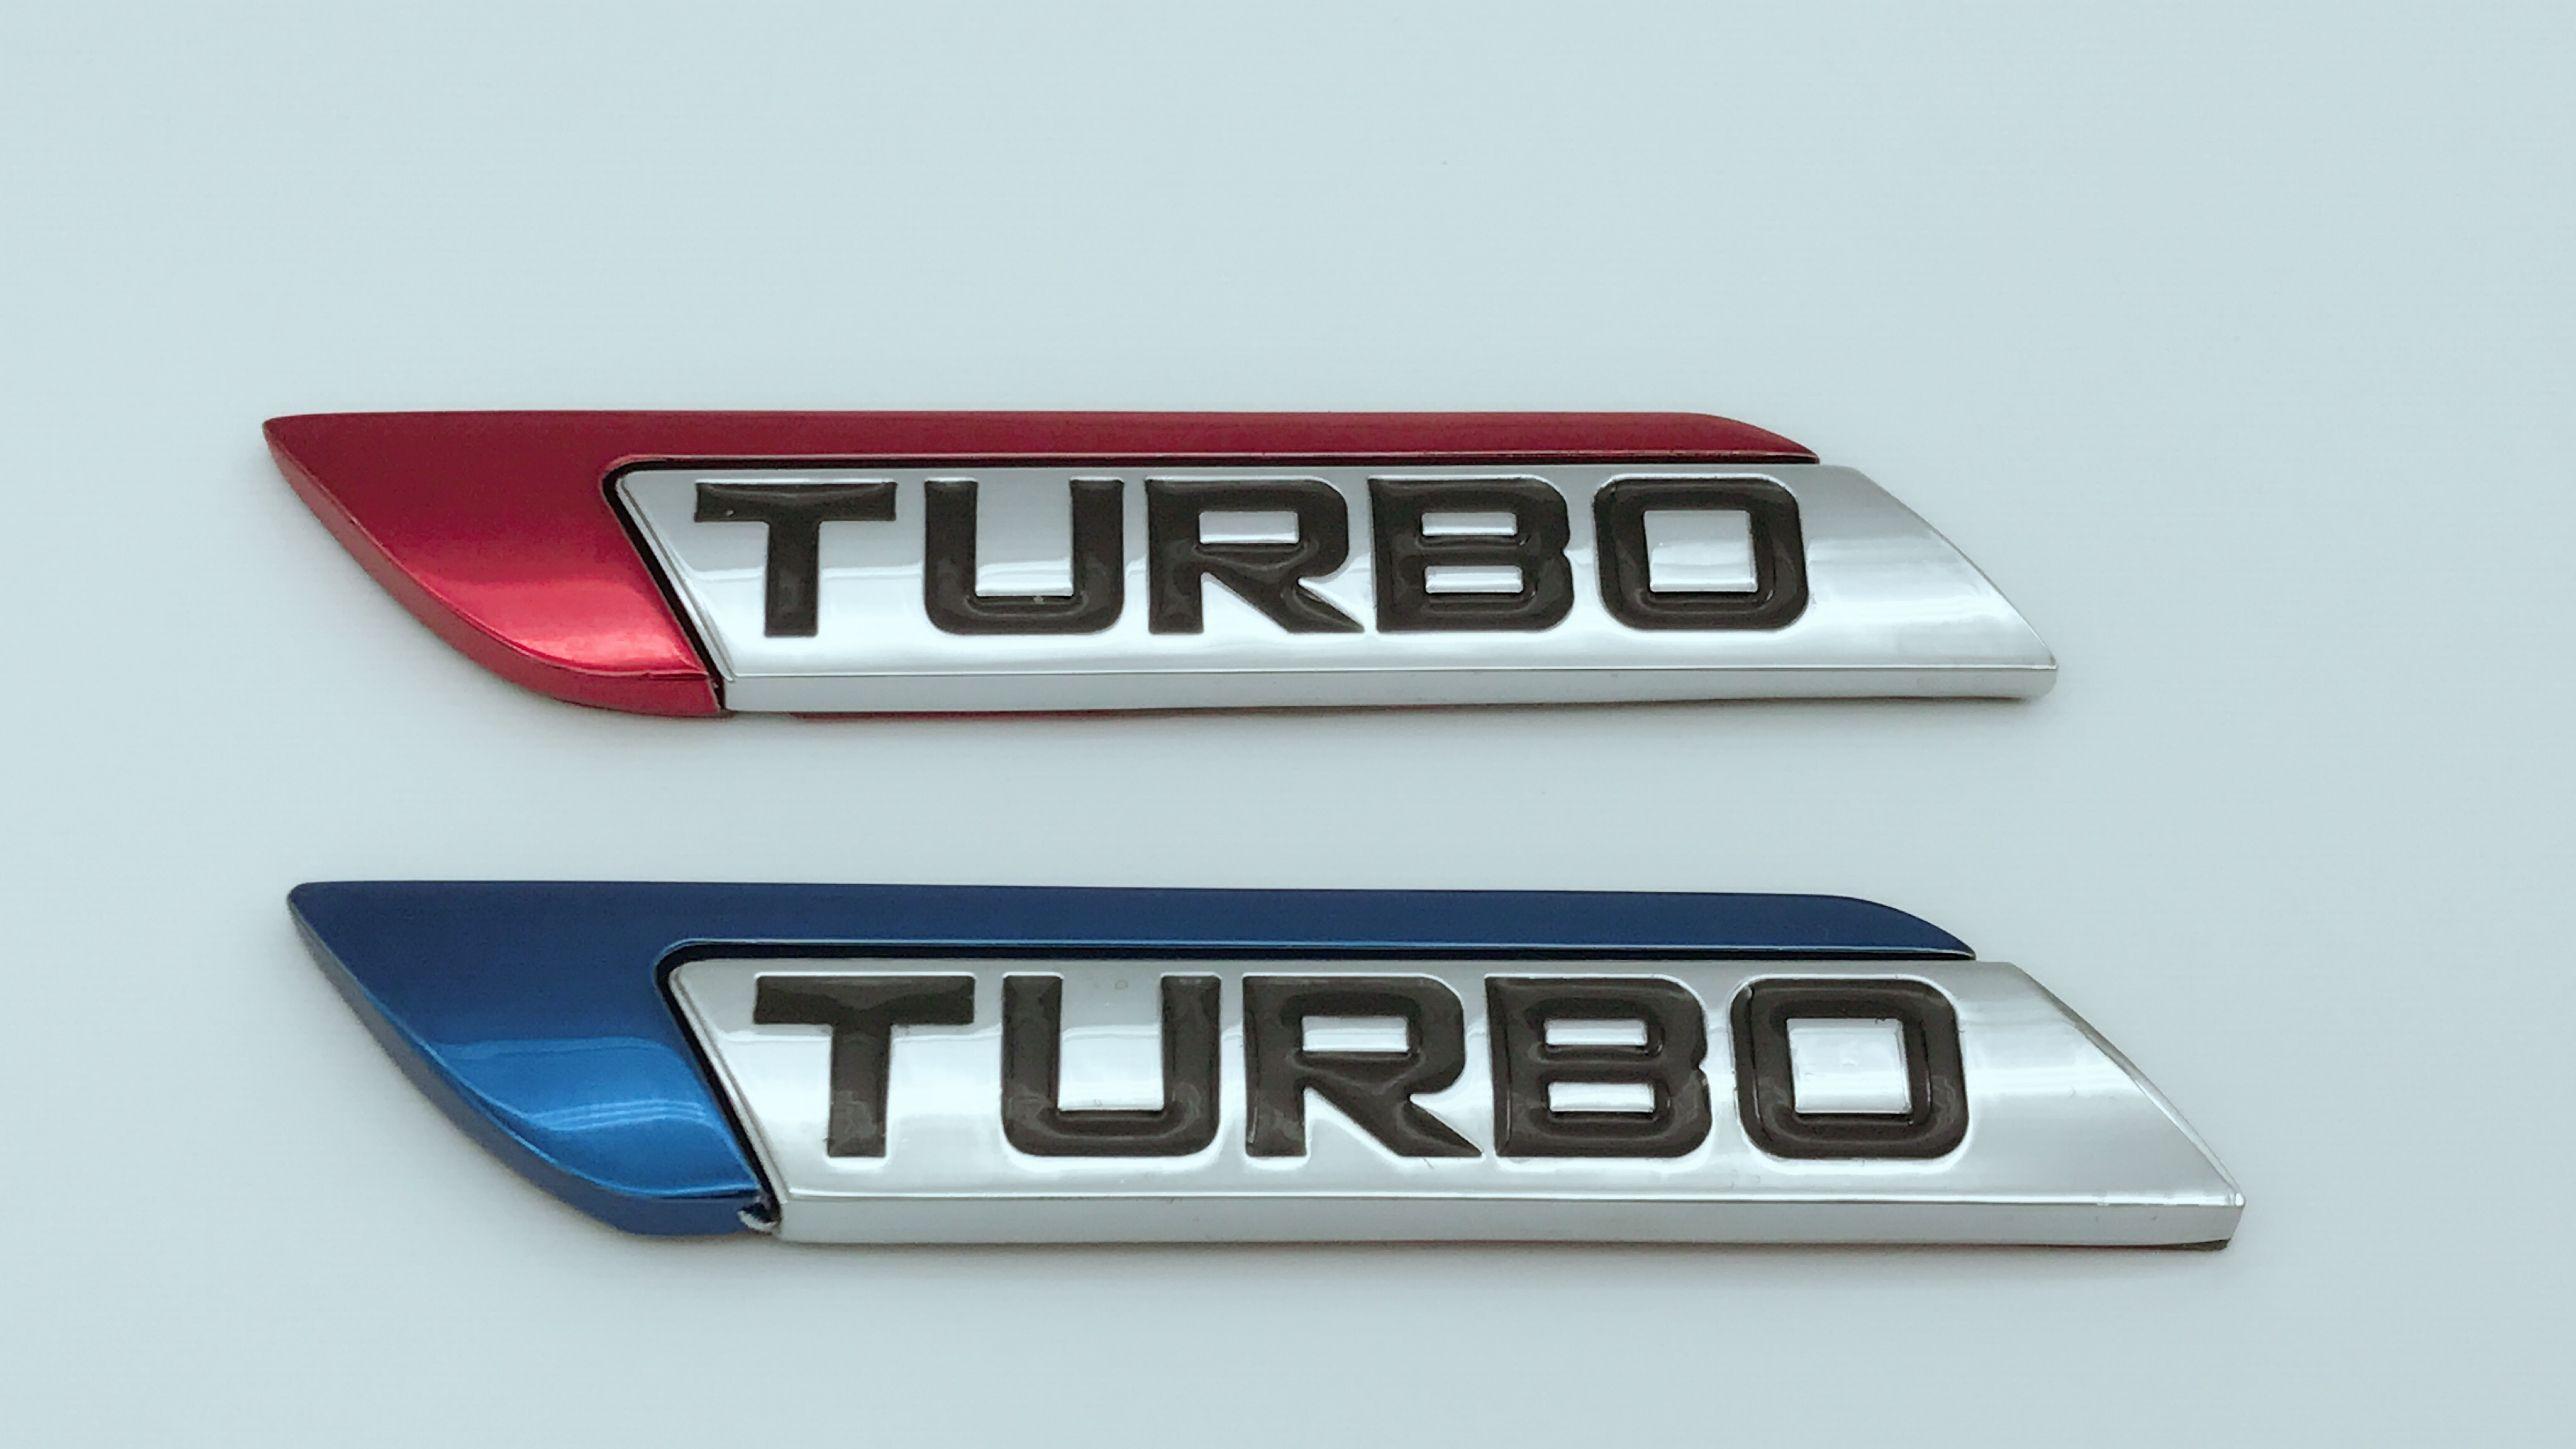 New Red / Blue Turbo Logo 3D Metal Car Auto SUV Corpo Parafango Emblema Badge Sticker Decal